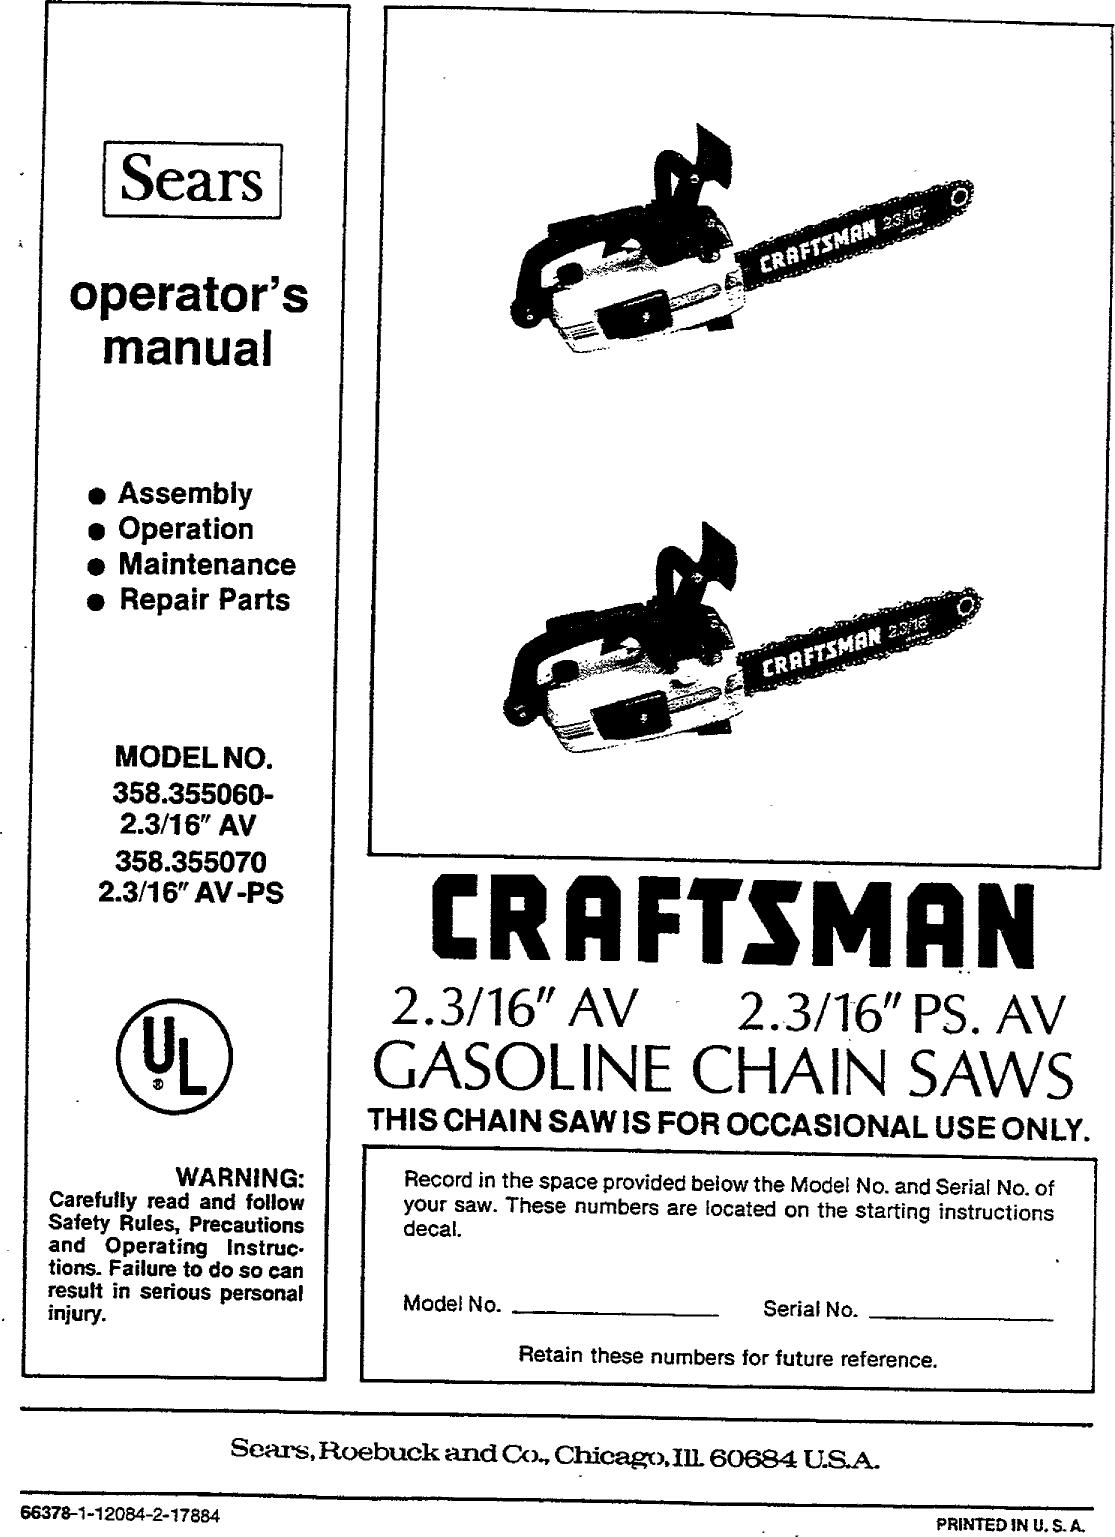 Craftsman 358355060 User Manual GASOLINE CHAIN SAWS